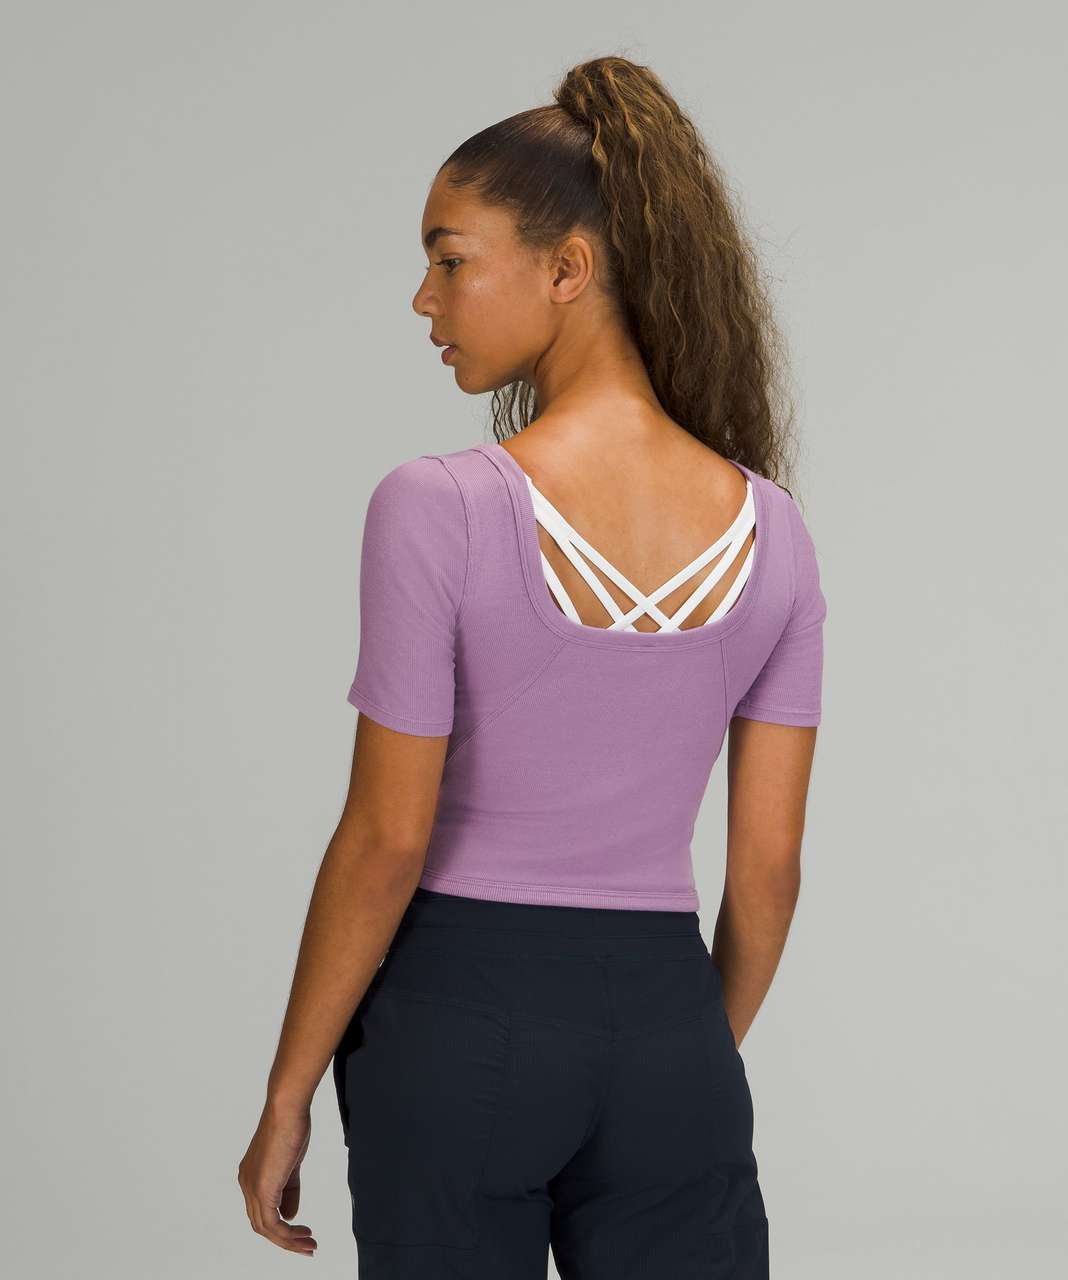 Lululemon Ribbed Held Tight Short Sleeve Shirt - Wisteria Purple